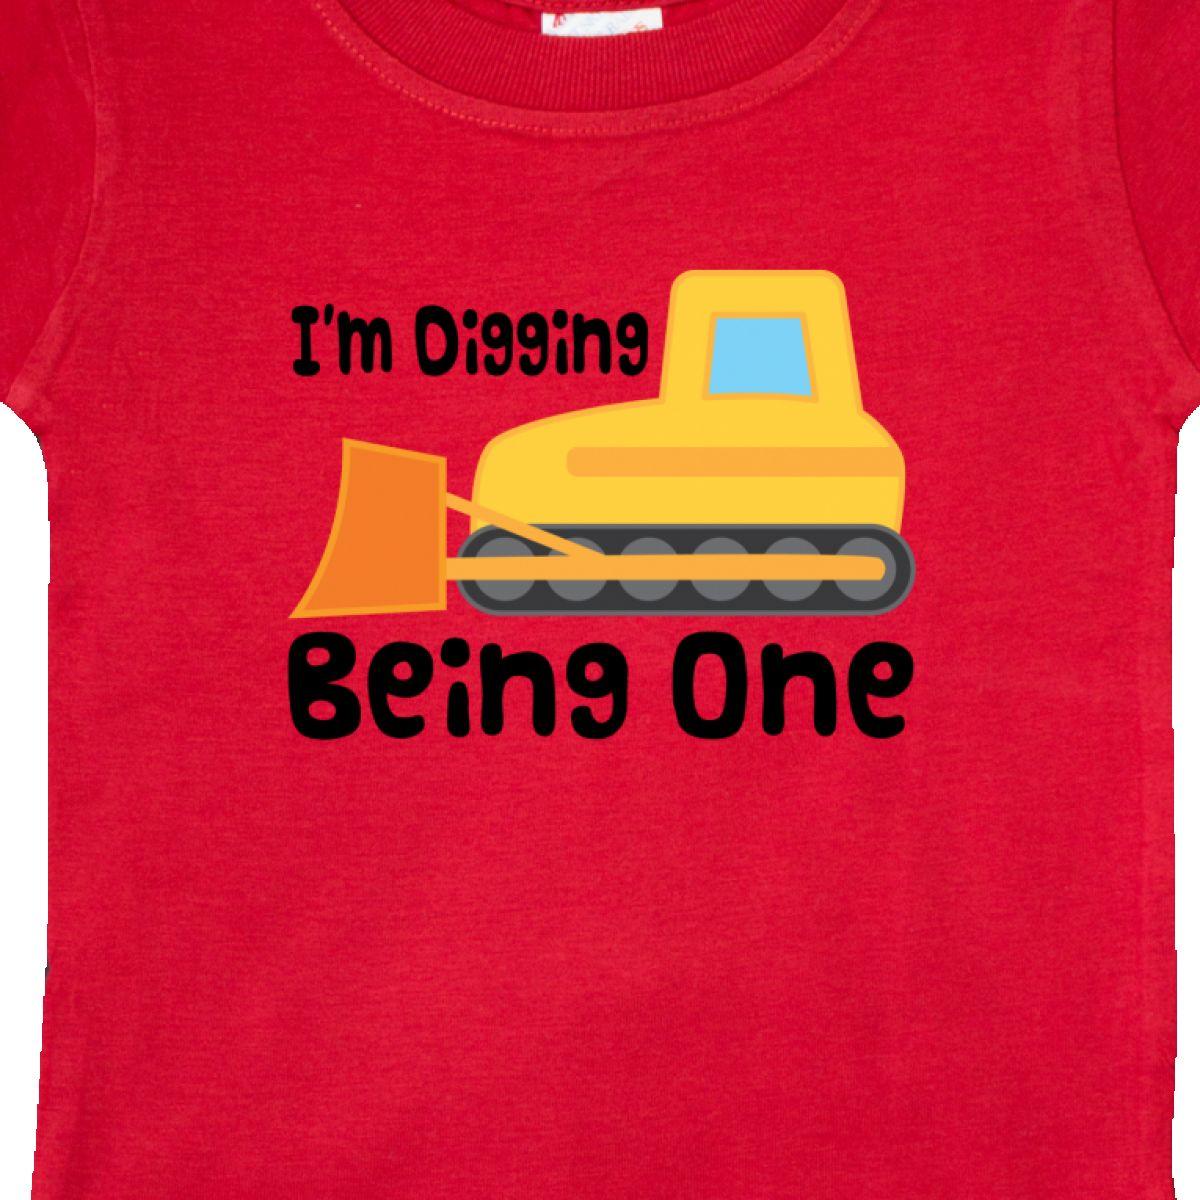 Inktastic Bulldozer 1st Birthday Baby T-Shirt Year Old Turning Dig Gift Idea For